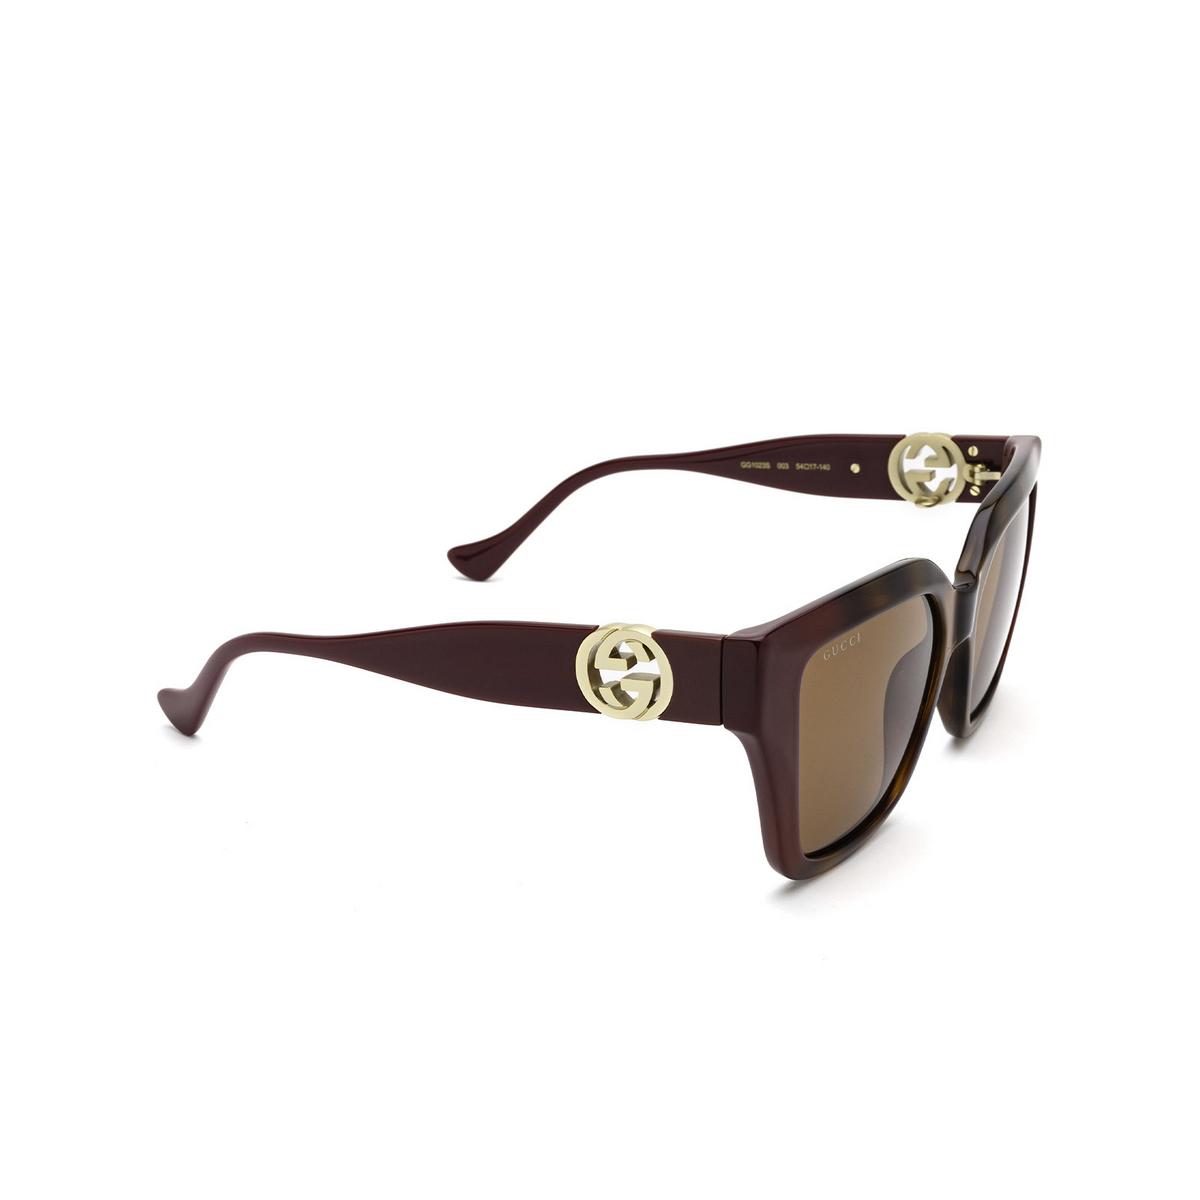 Gucci® Cat-eye Sunglasses: GG1023S color Havana & Burgundy 003 - three-quarters view.